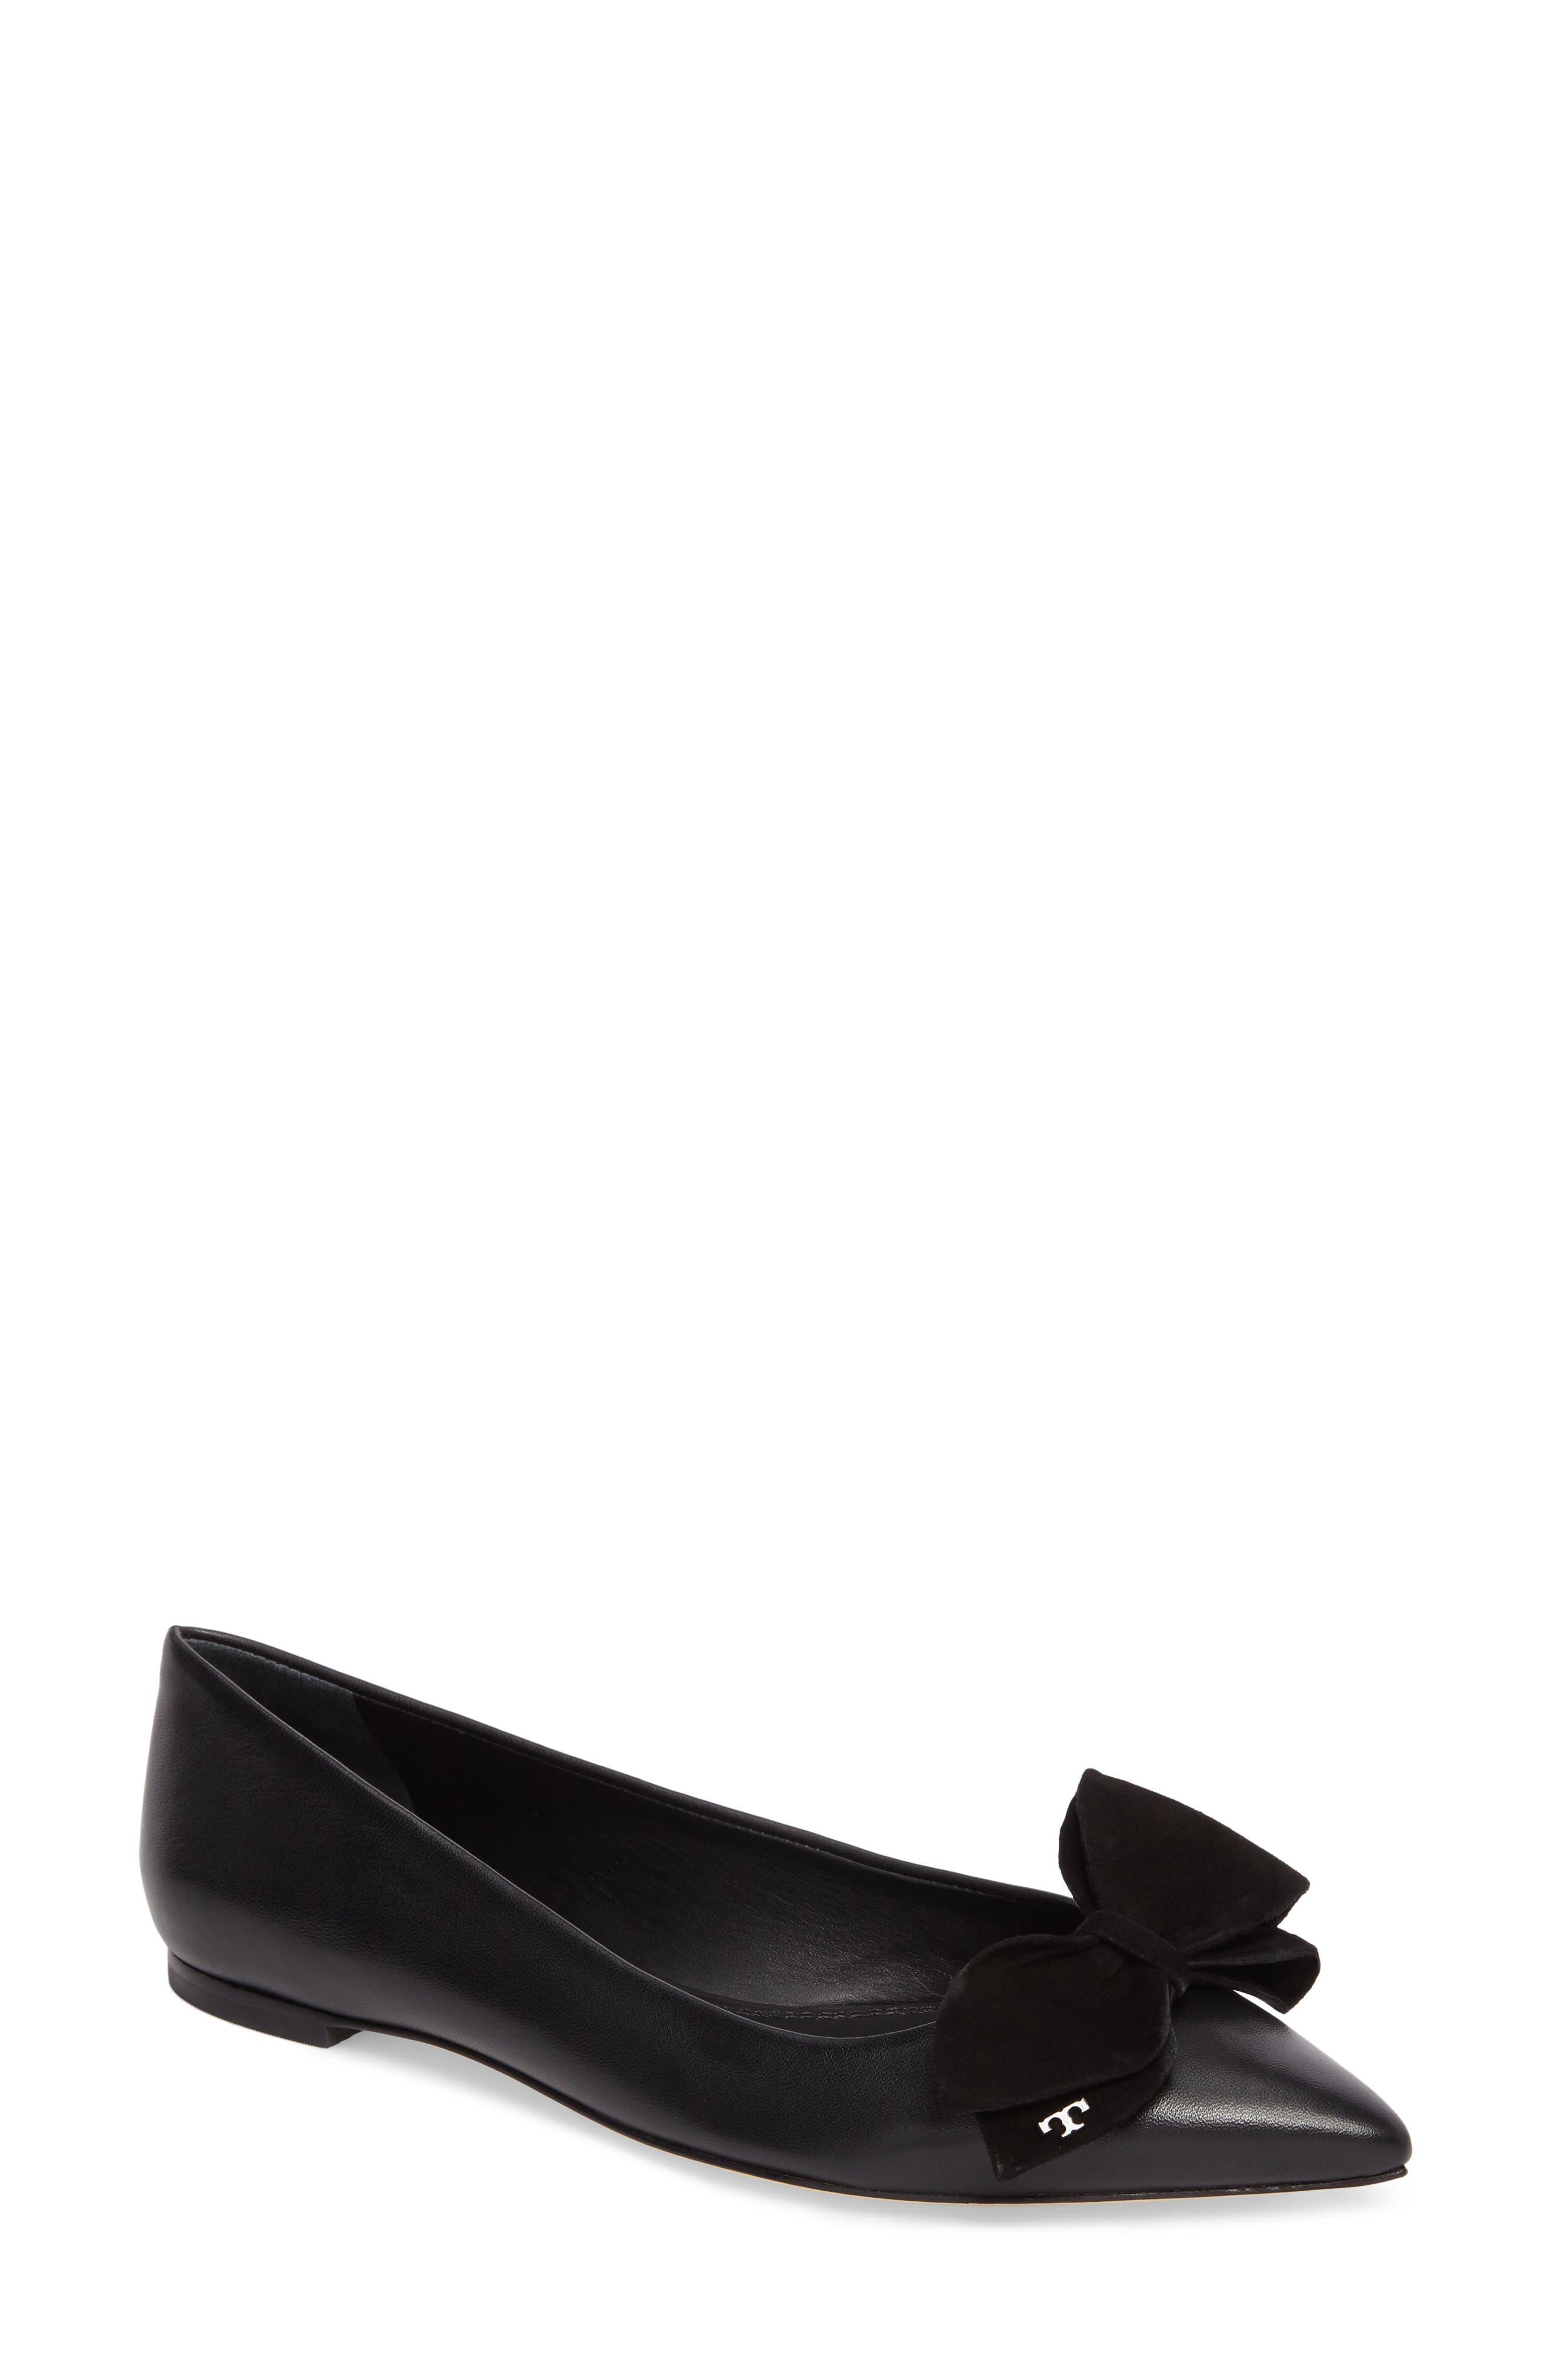 Main Image - Tory Burch Rosalind Bow Pointy Toe Flat (Women)